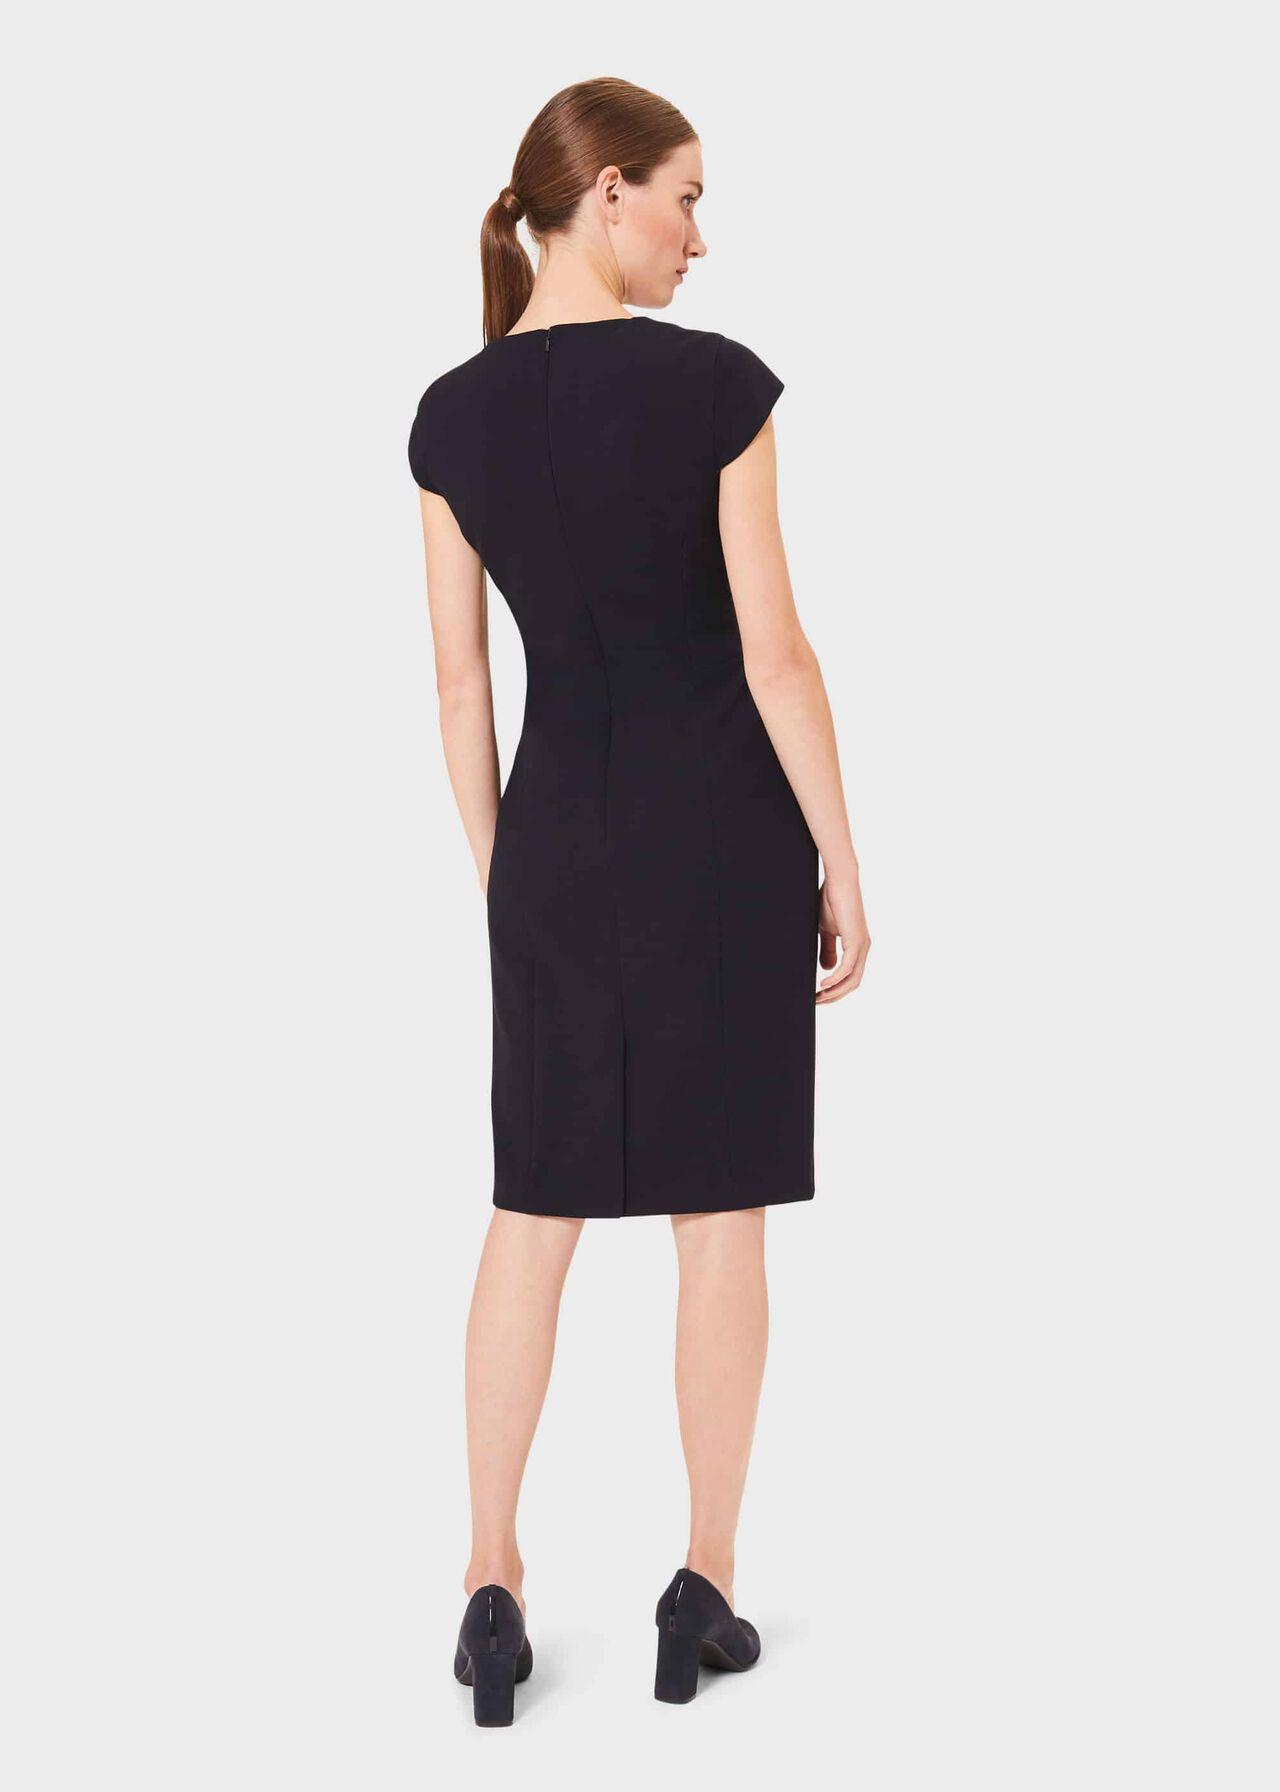 Leila Dress, Navy, hi-res